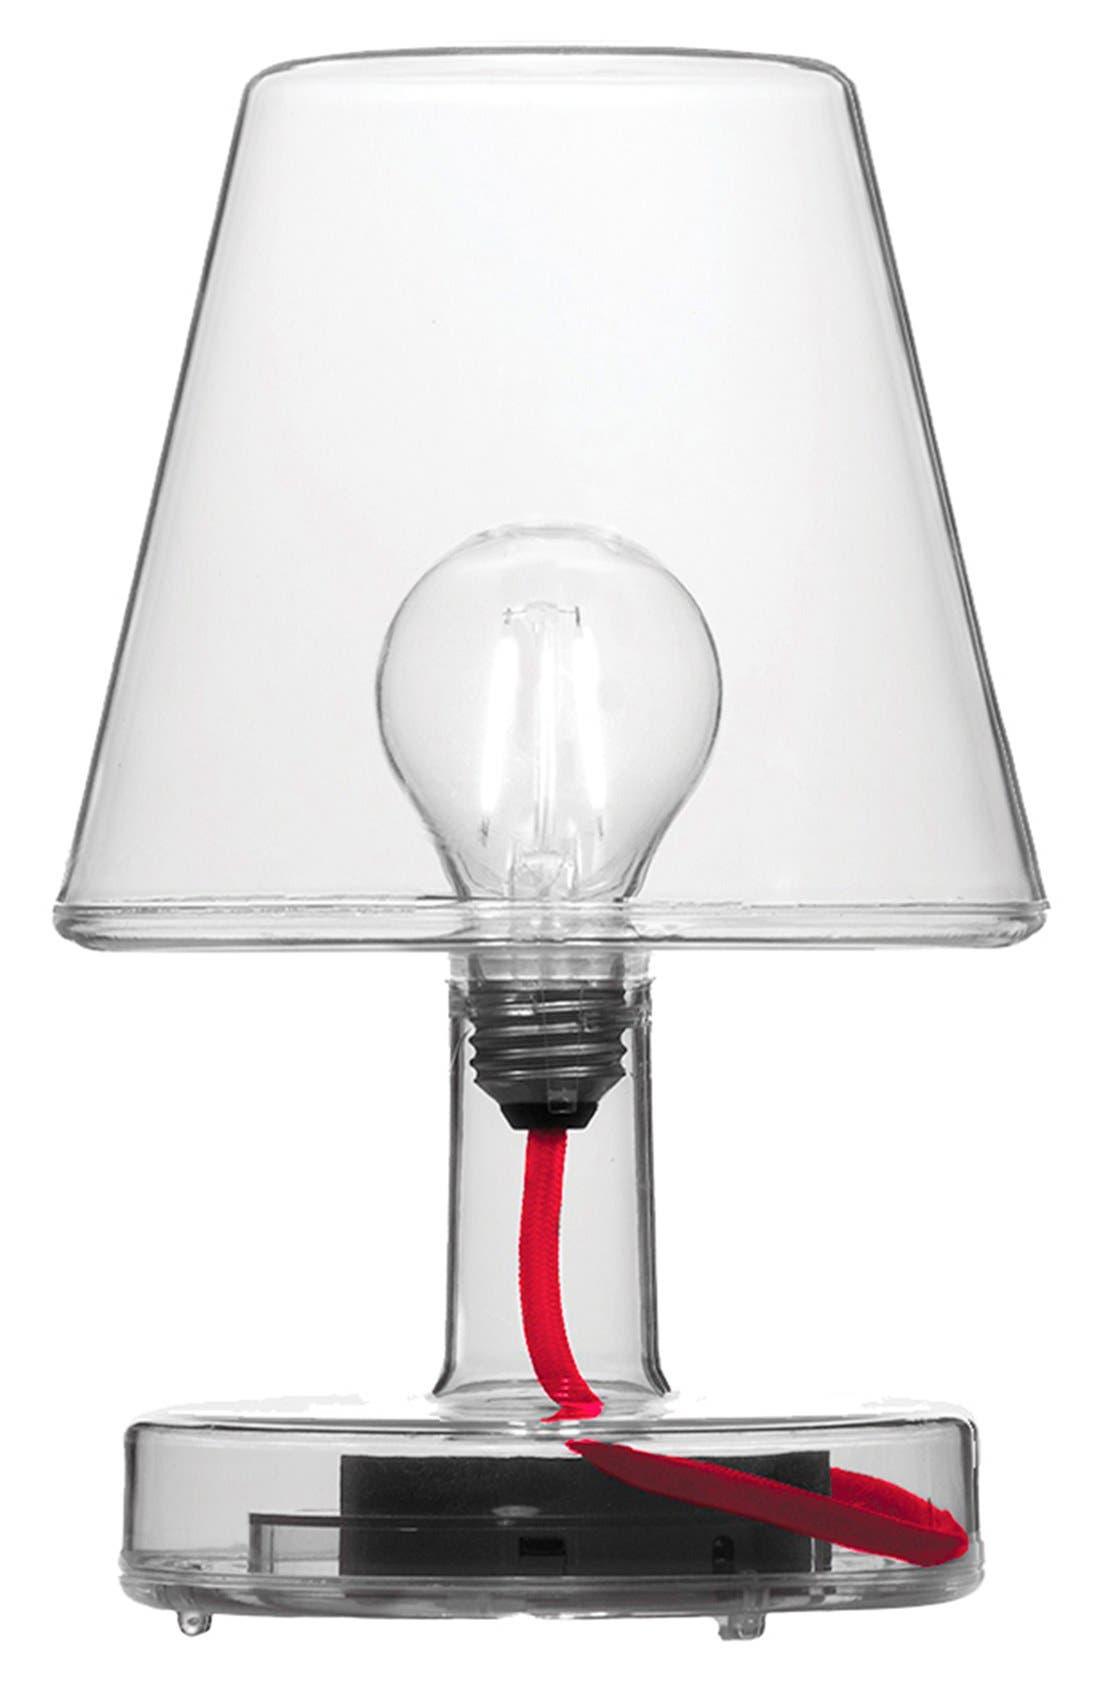 Transloetje Lamp,                         Main,                         color, 020